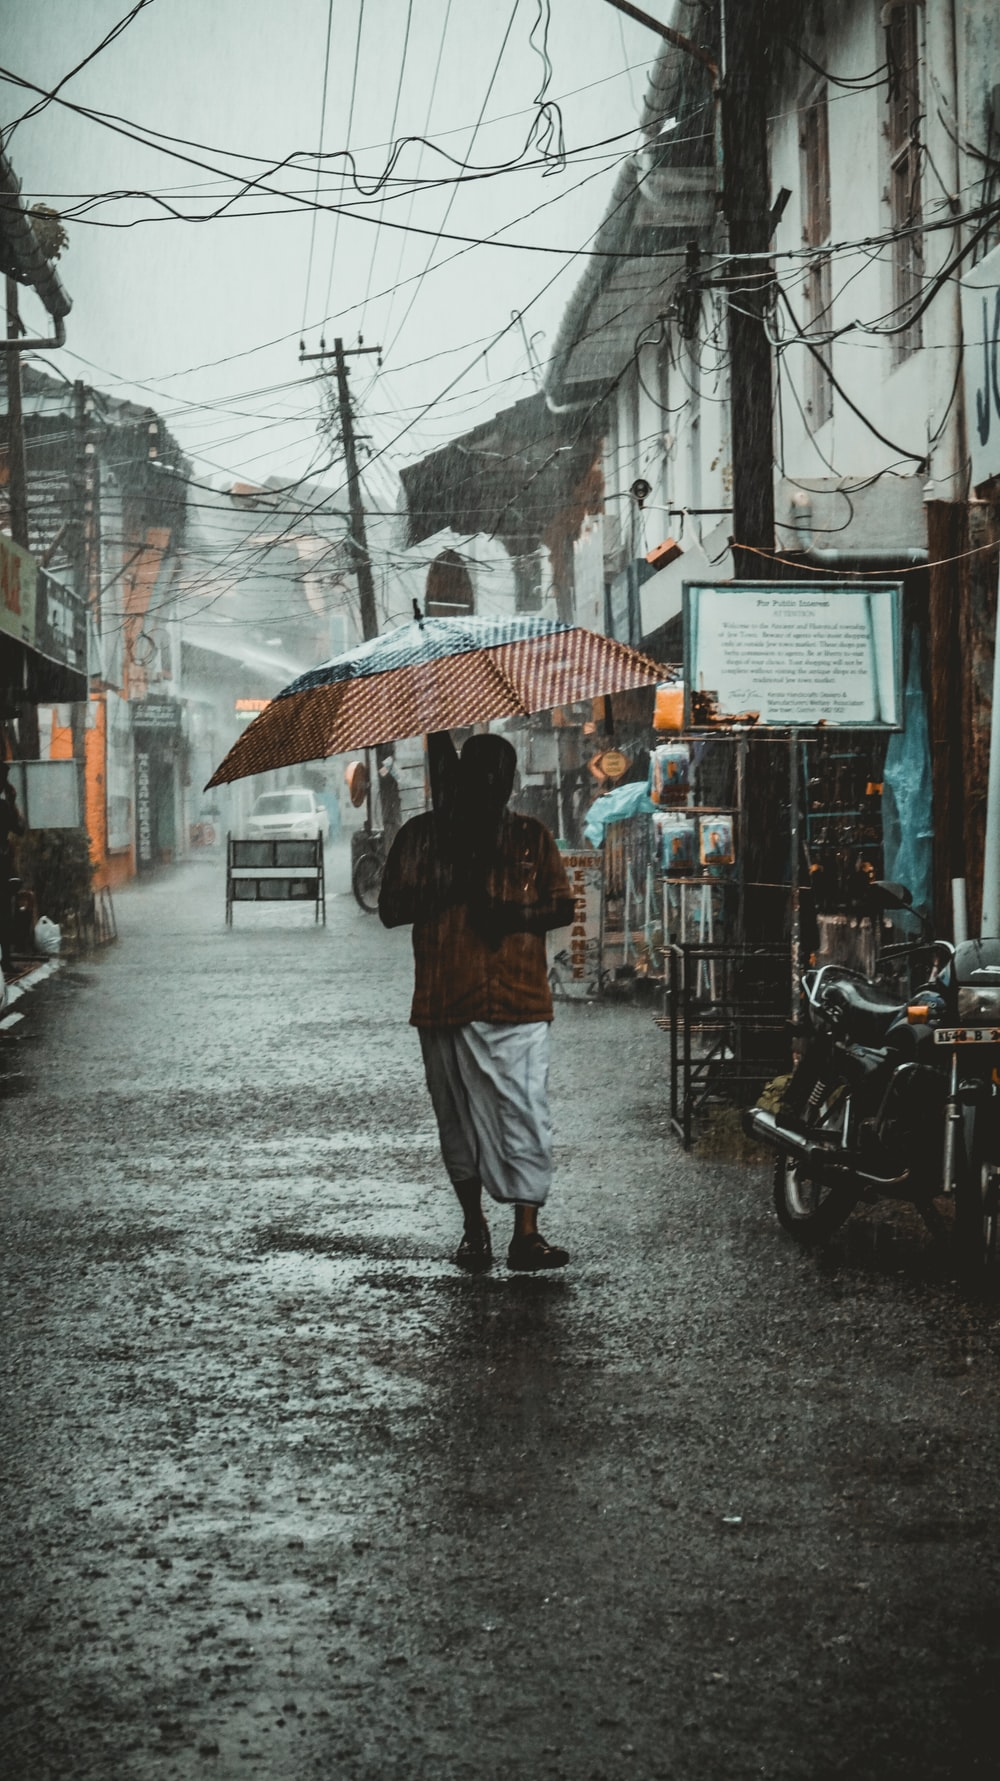 woman using umbrella under rain